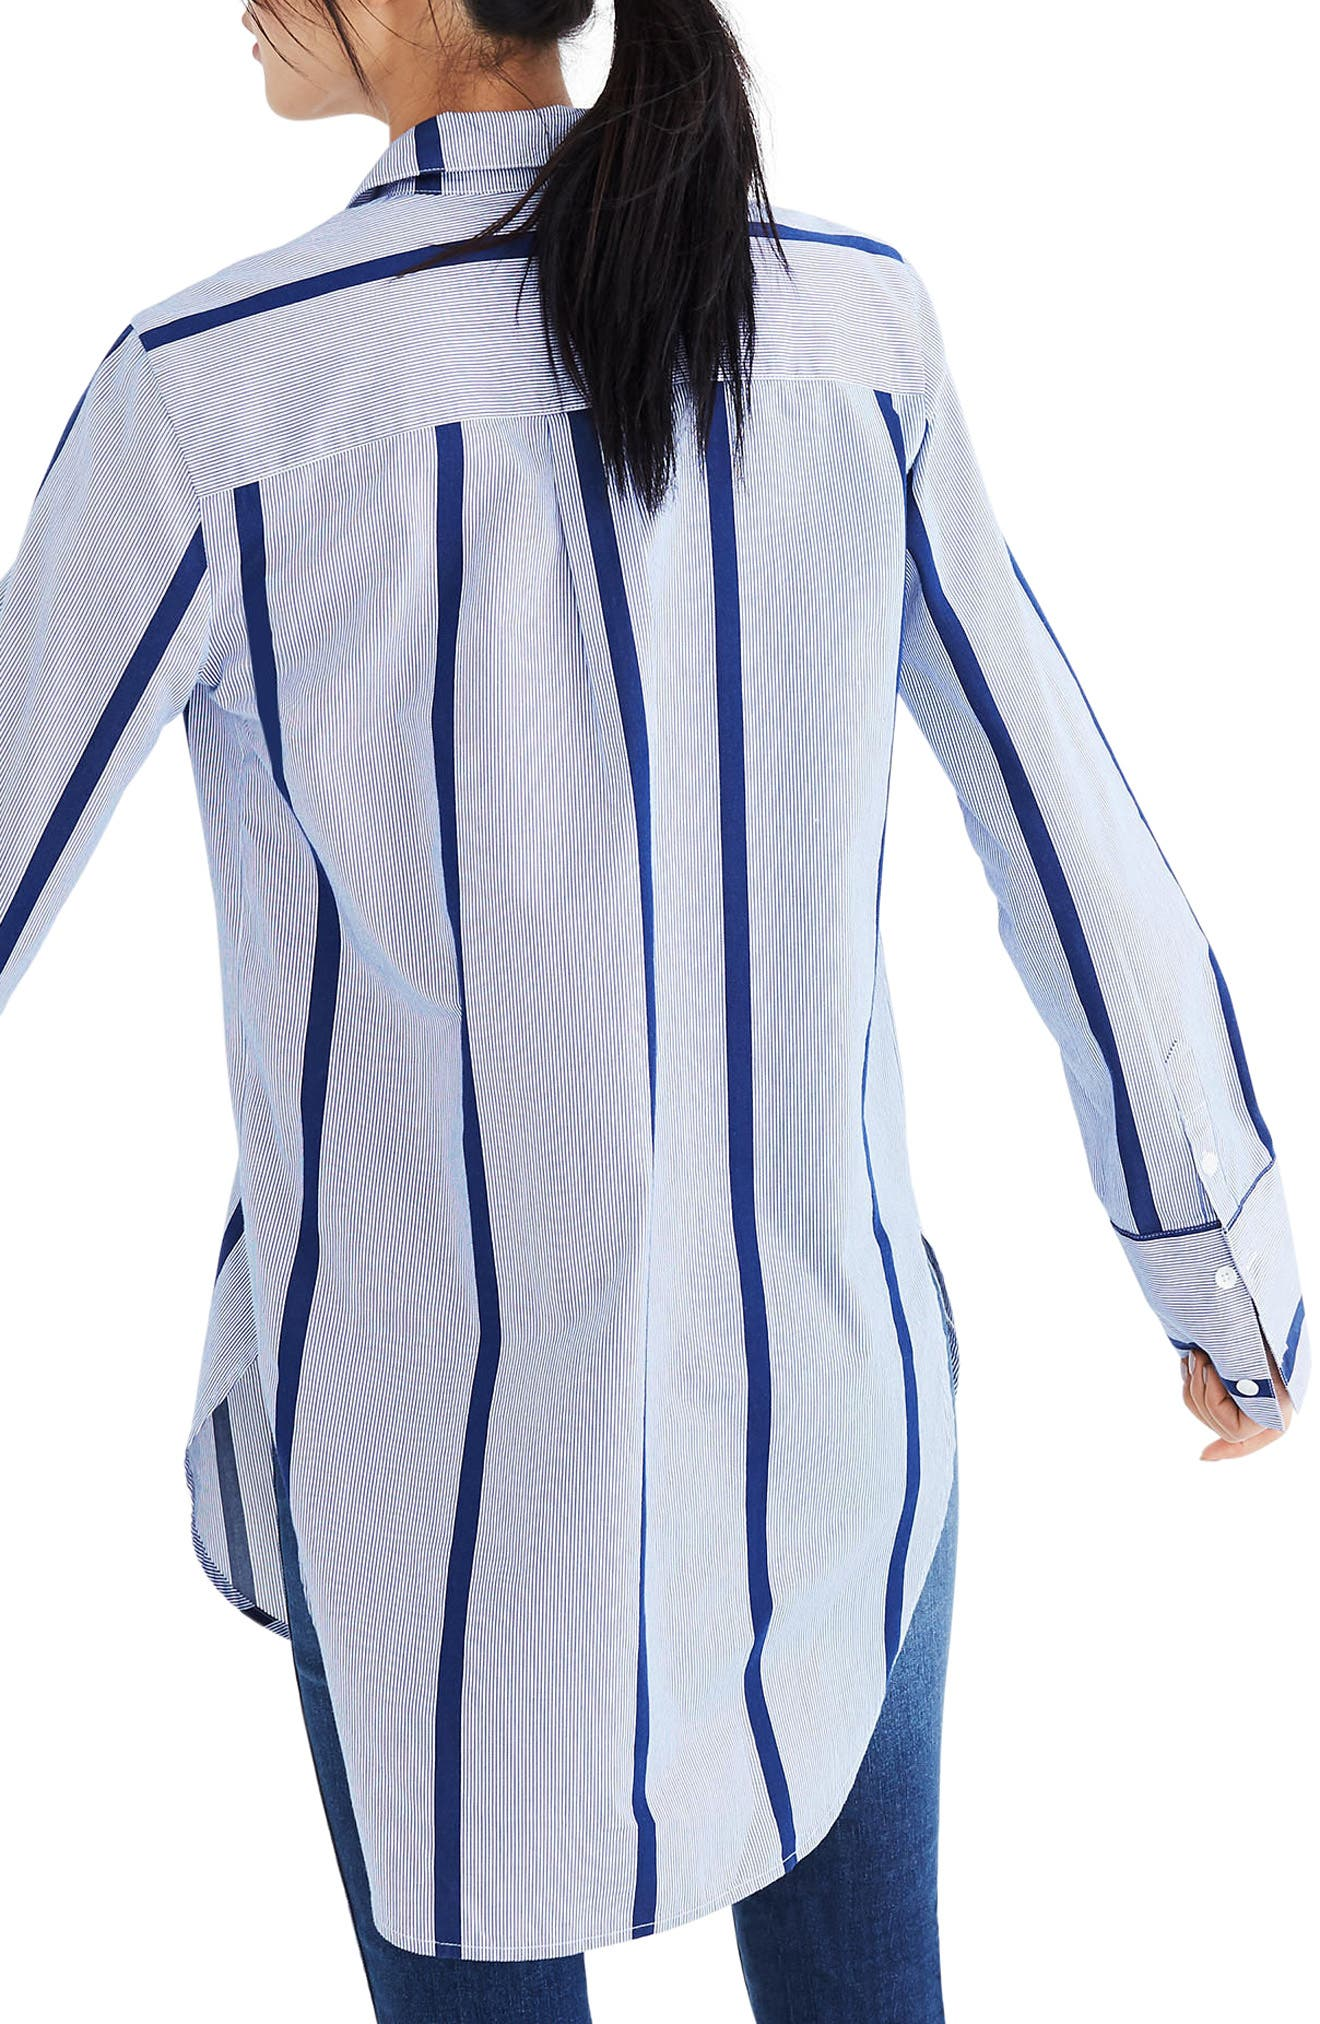 Stripe Button Down Tunic Shirt,                             Alternate thumbnail 2, color,                             Jordan Stripe Midnight